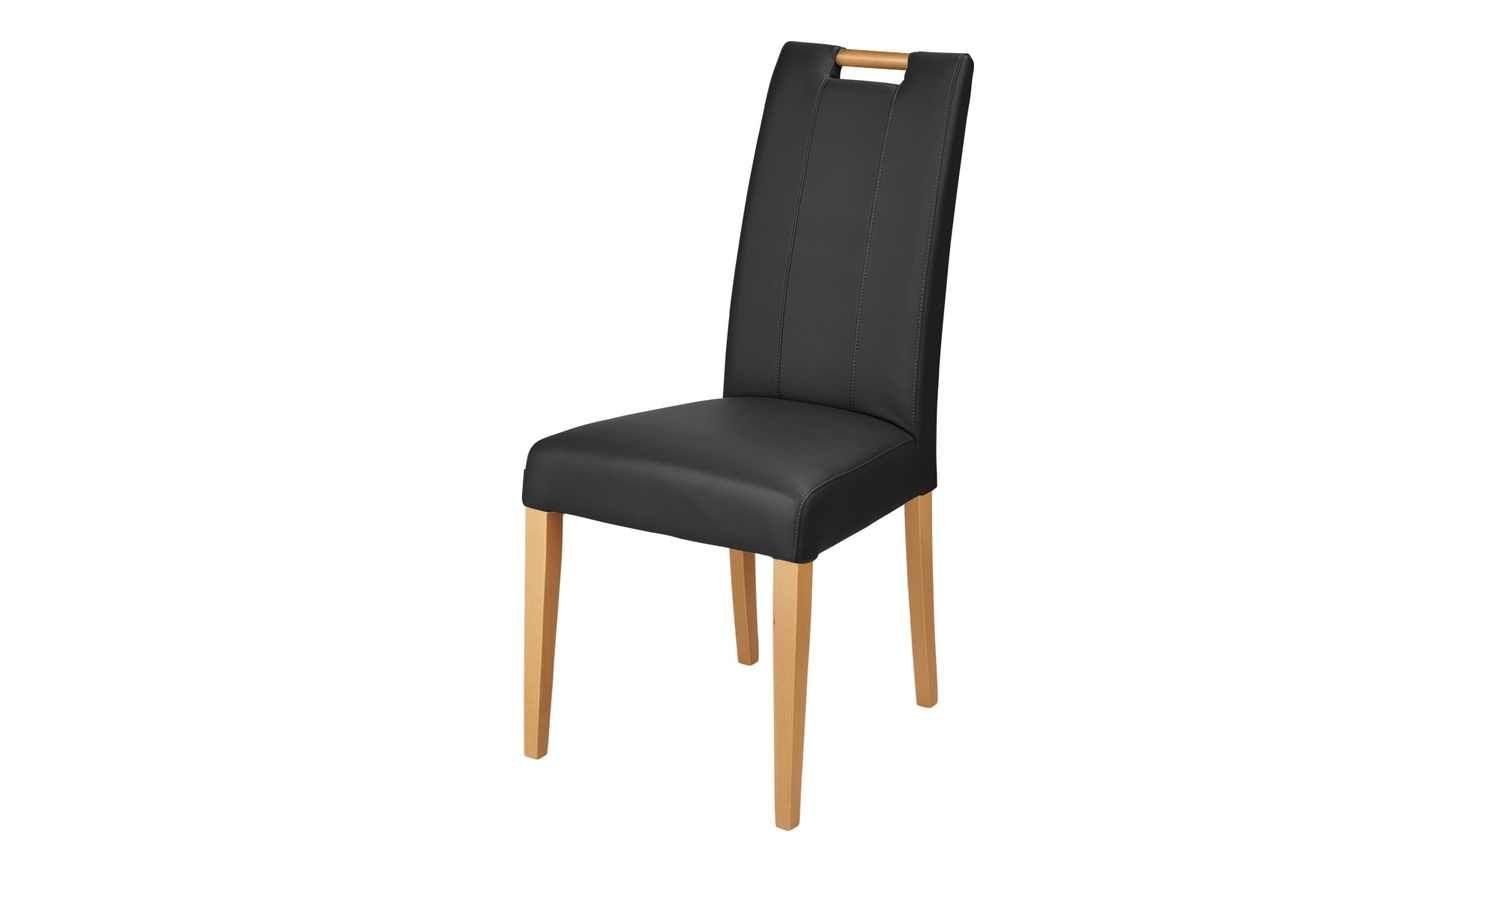 Gabi 2 Esszimmerstuhle Stuhle Stuhl Design